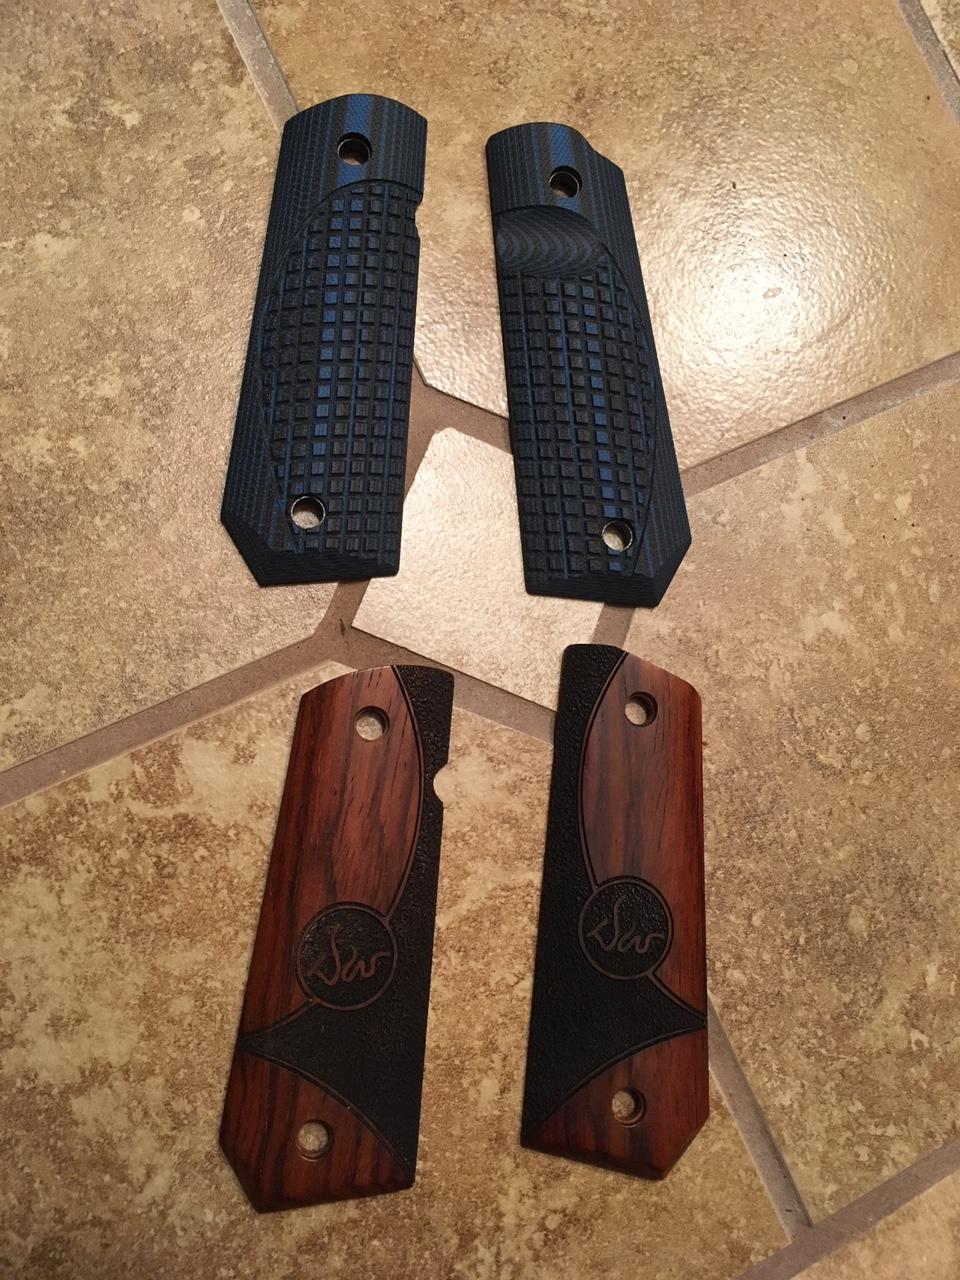 1911 grips, VZ and Dan Wesson - Calguns net